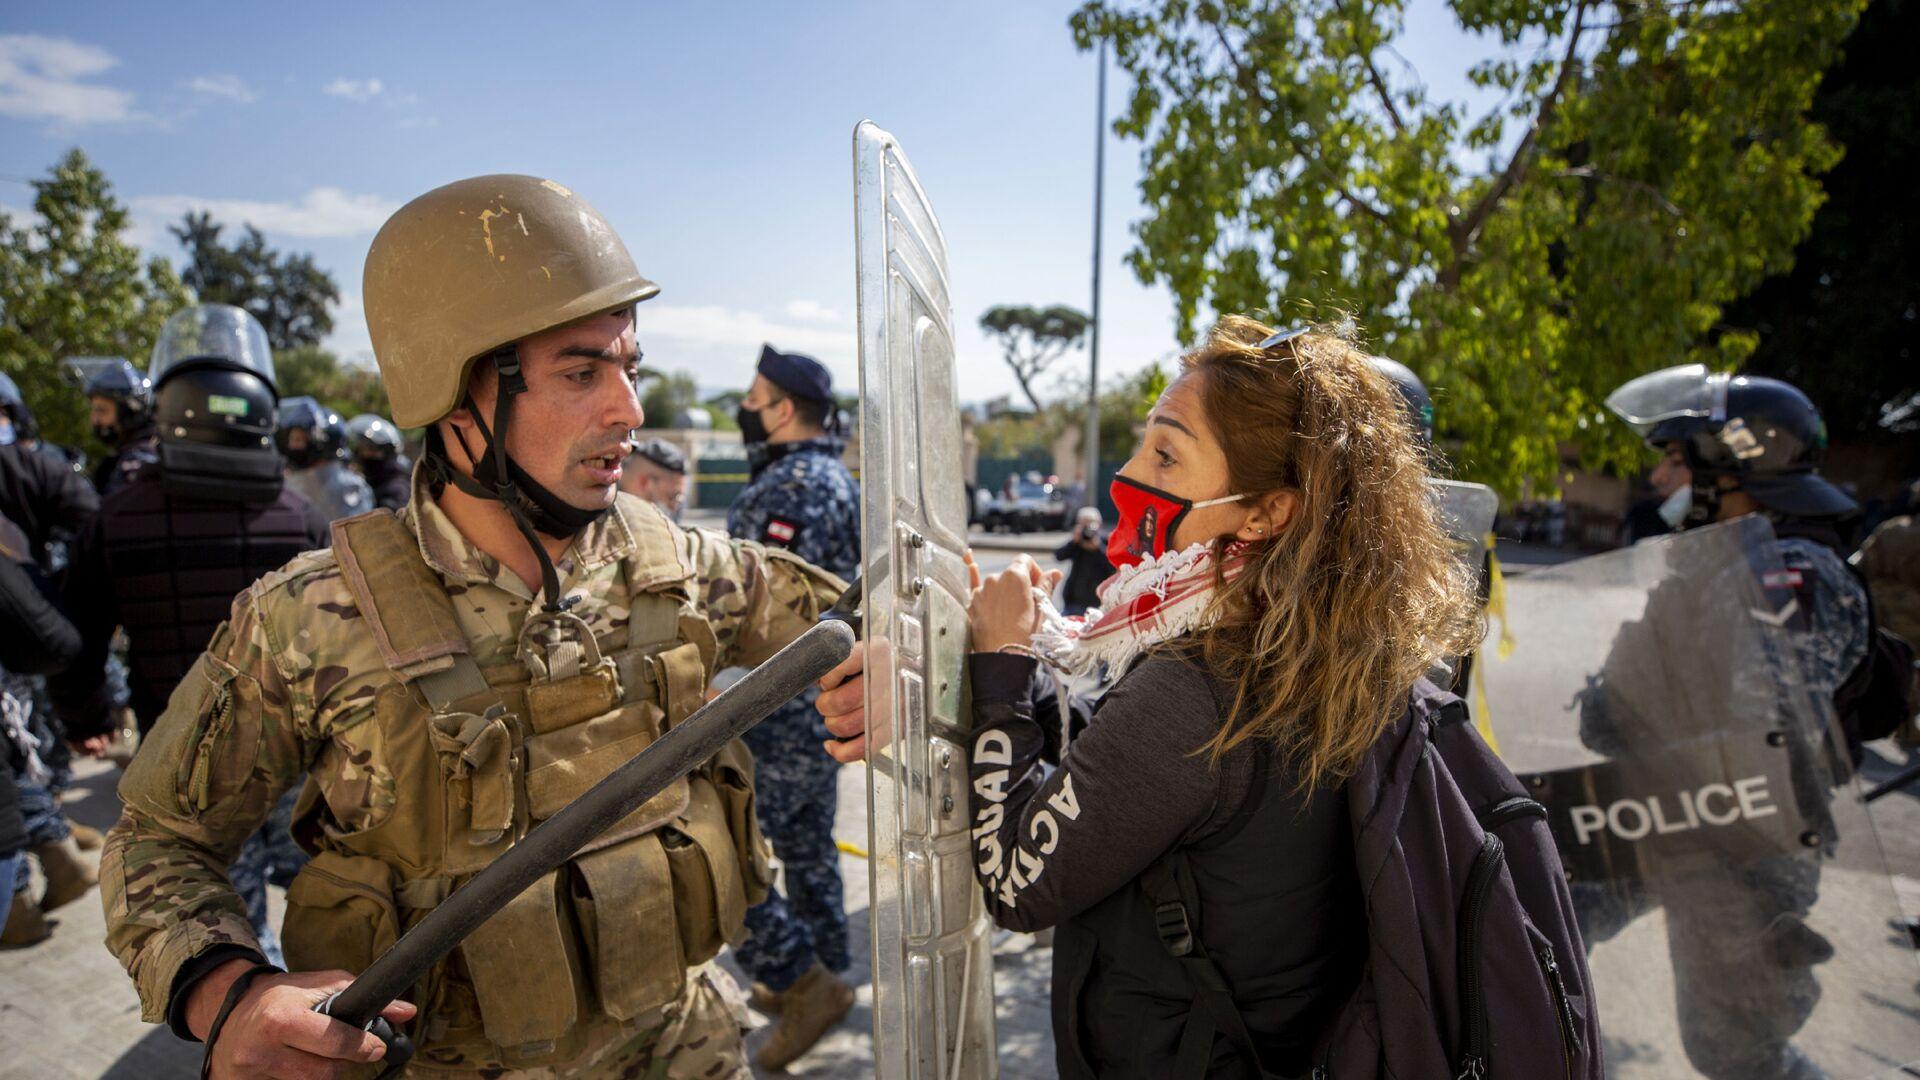 Стычка между силами правопорядка и протестующими в Бейруте, Ливан - Sputnik Italia, 1920, 17.08.2021